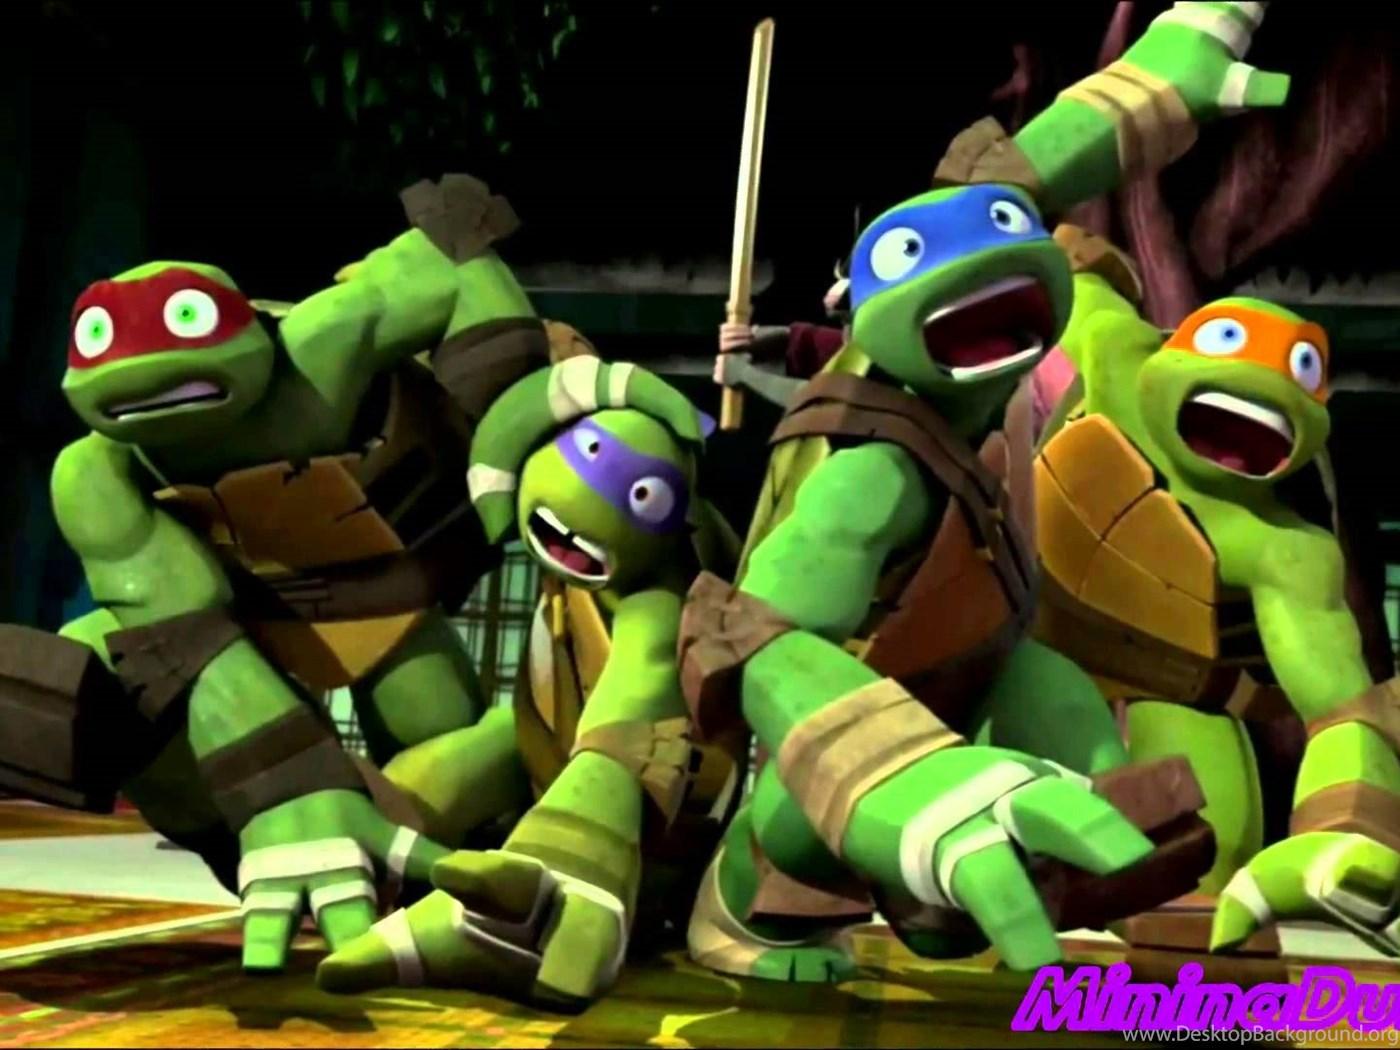 Teenage Mutant Ninja Turtles Desktop Wallpapers Desktop Background